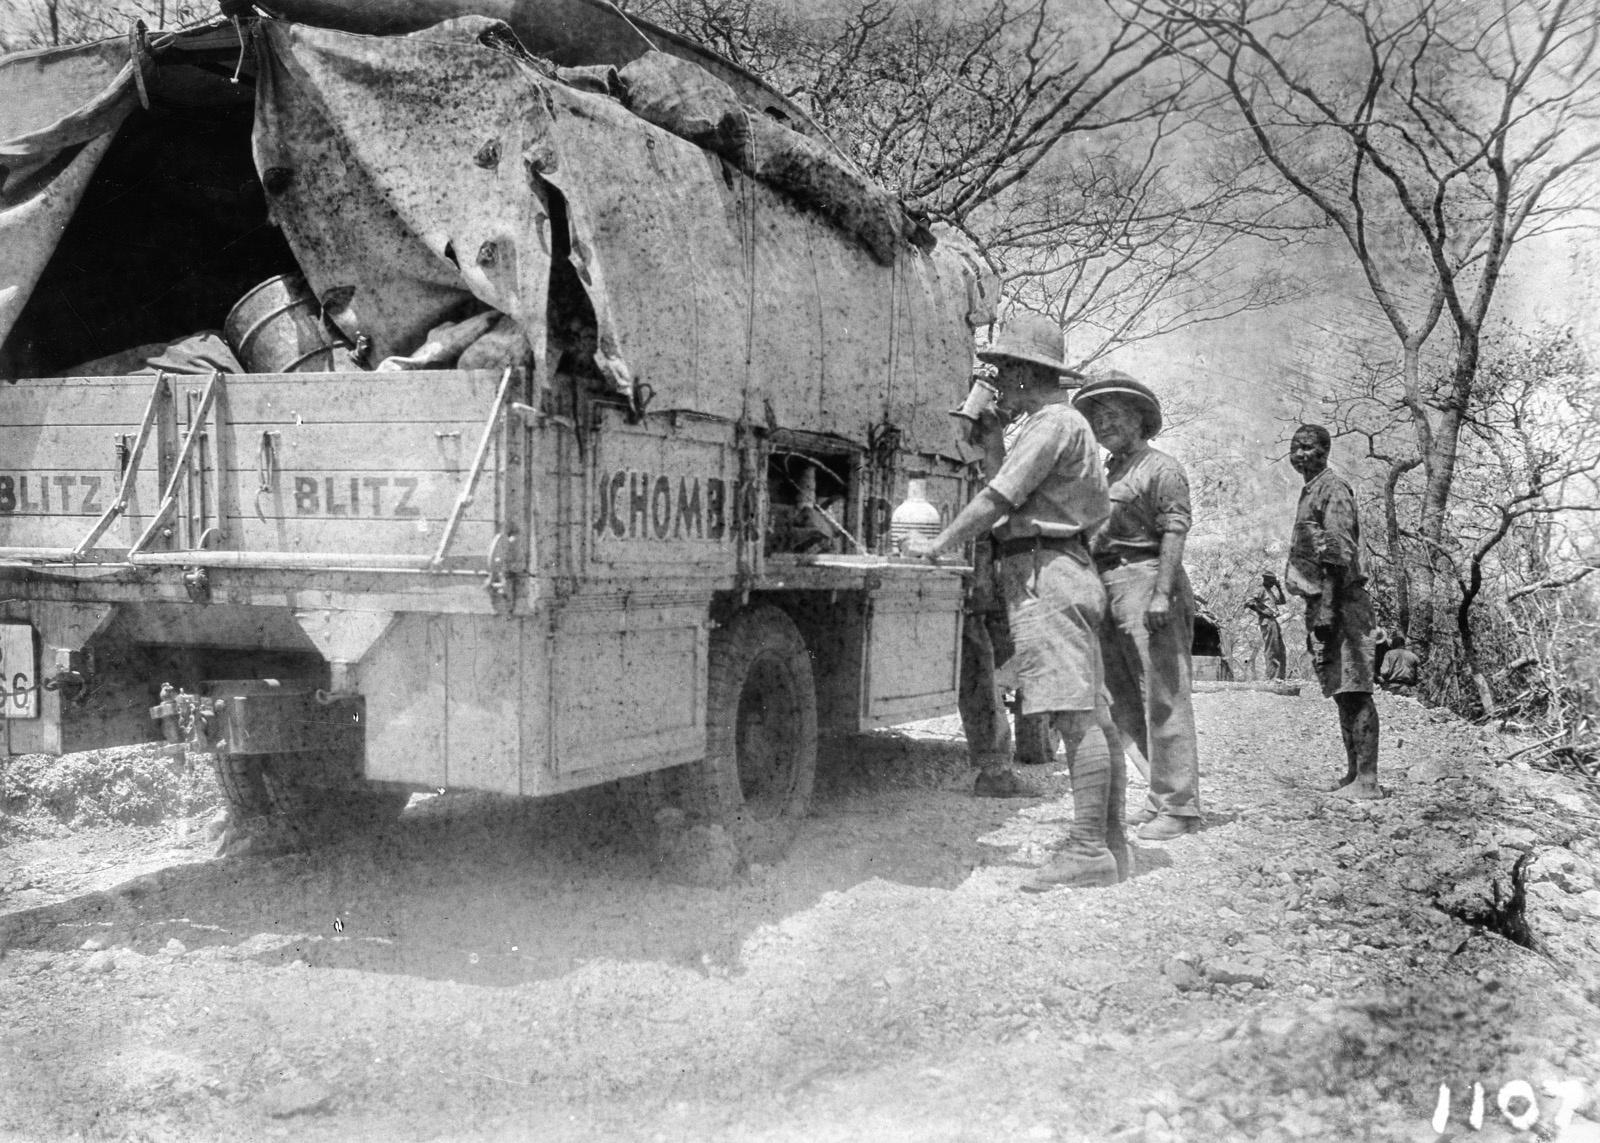 1107. Лундази. Участники экспедиции отдыхают возле грузовика.